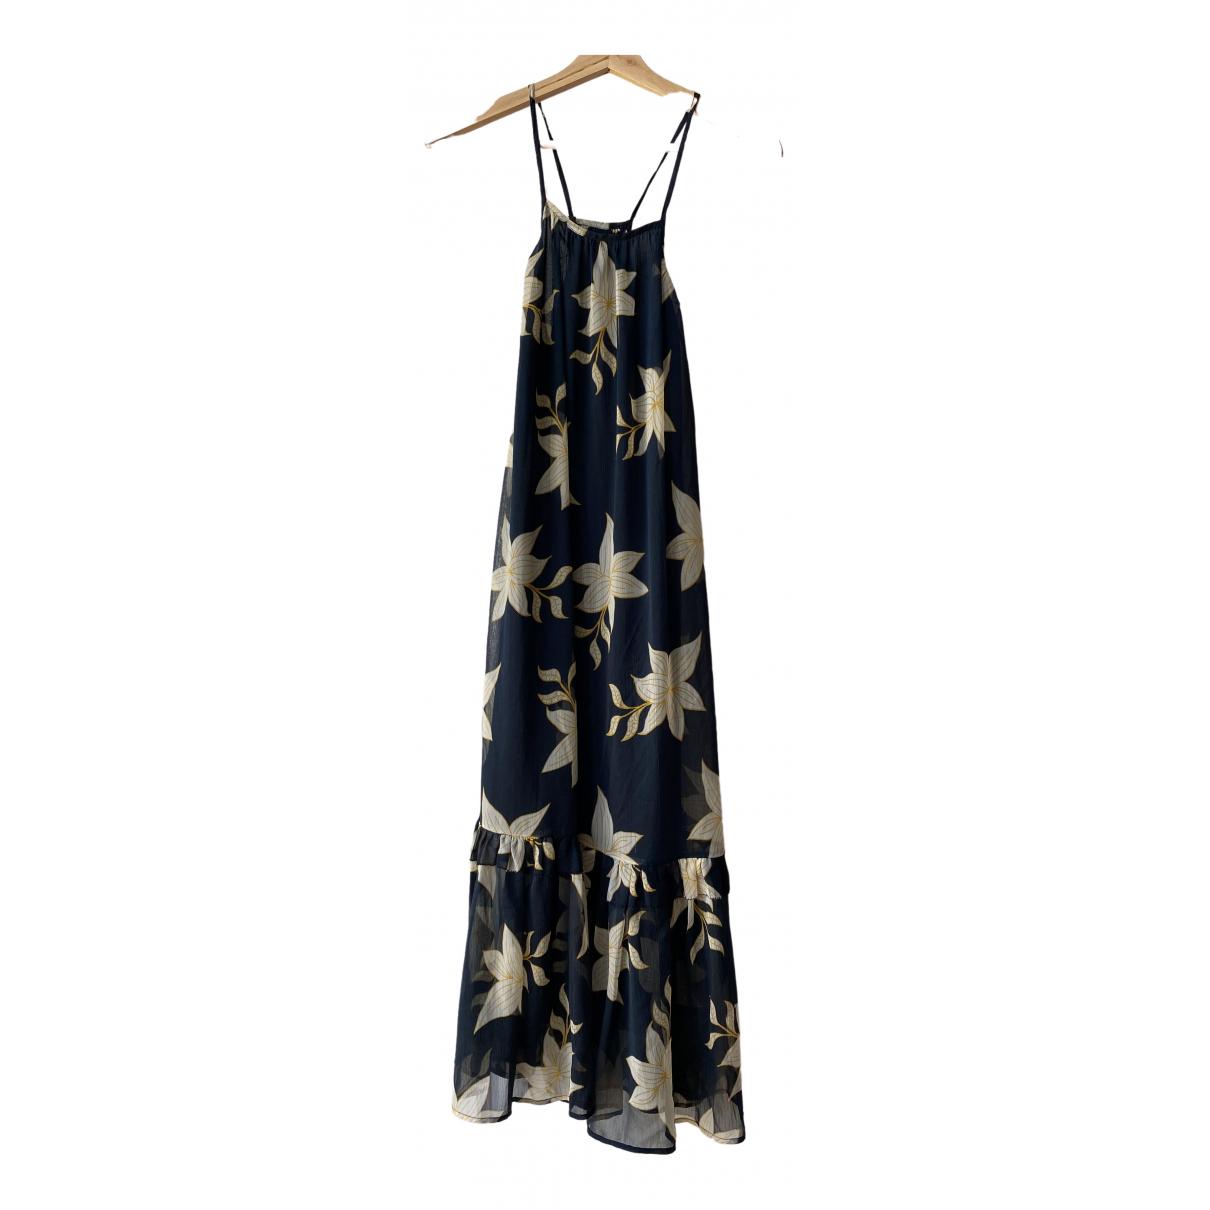 Mango \N Navy dress for Women S International